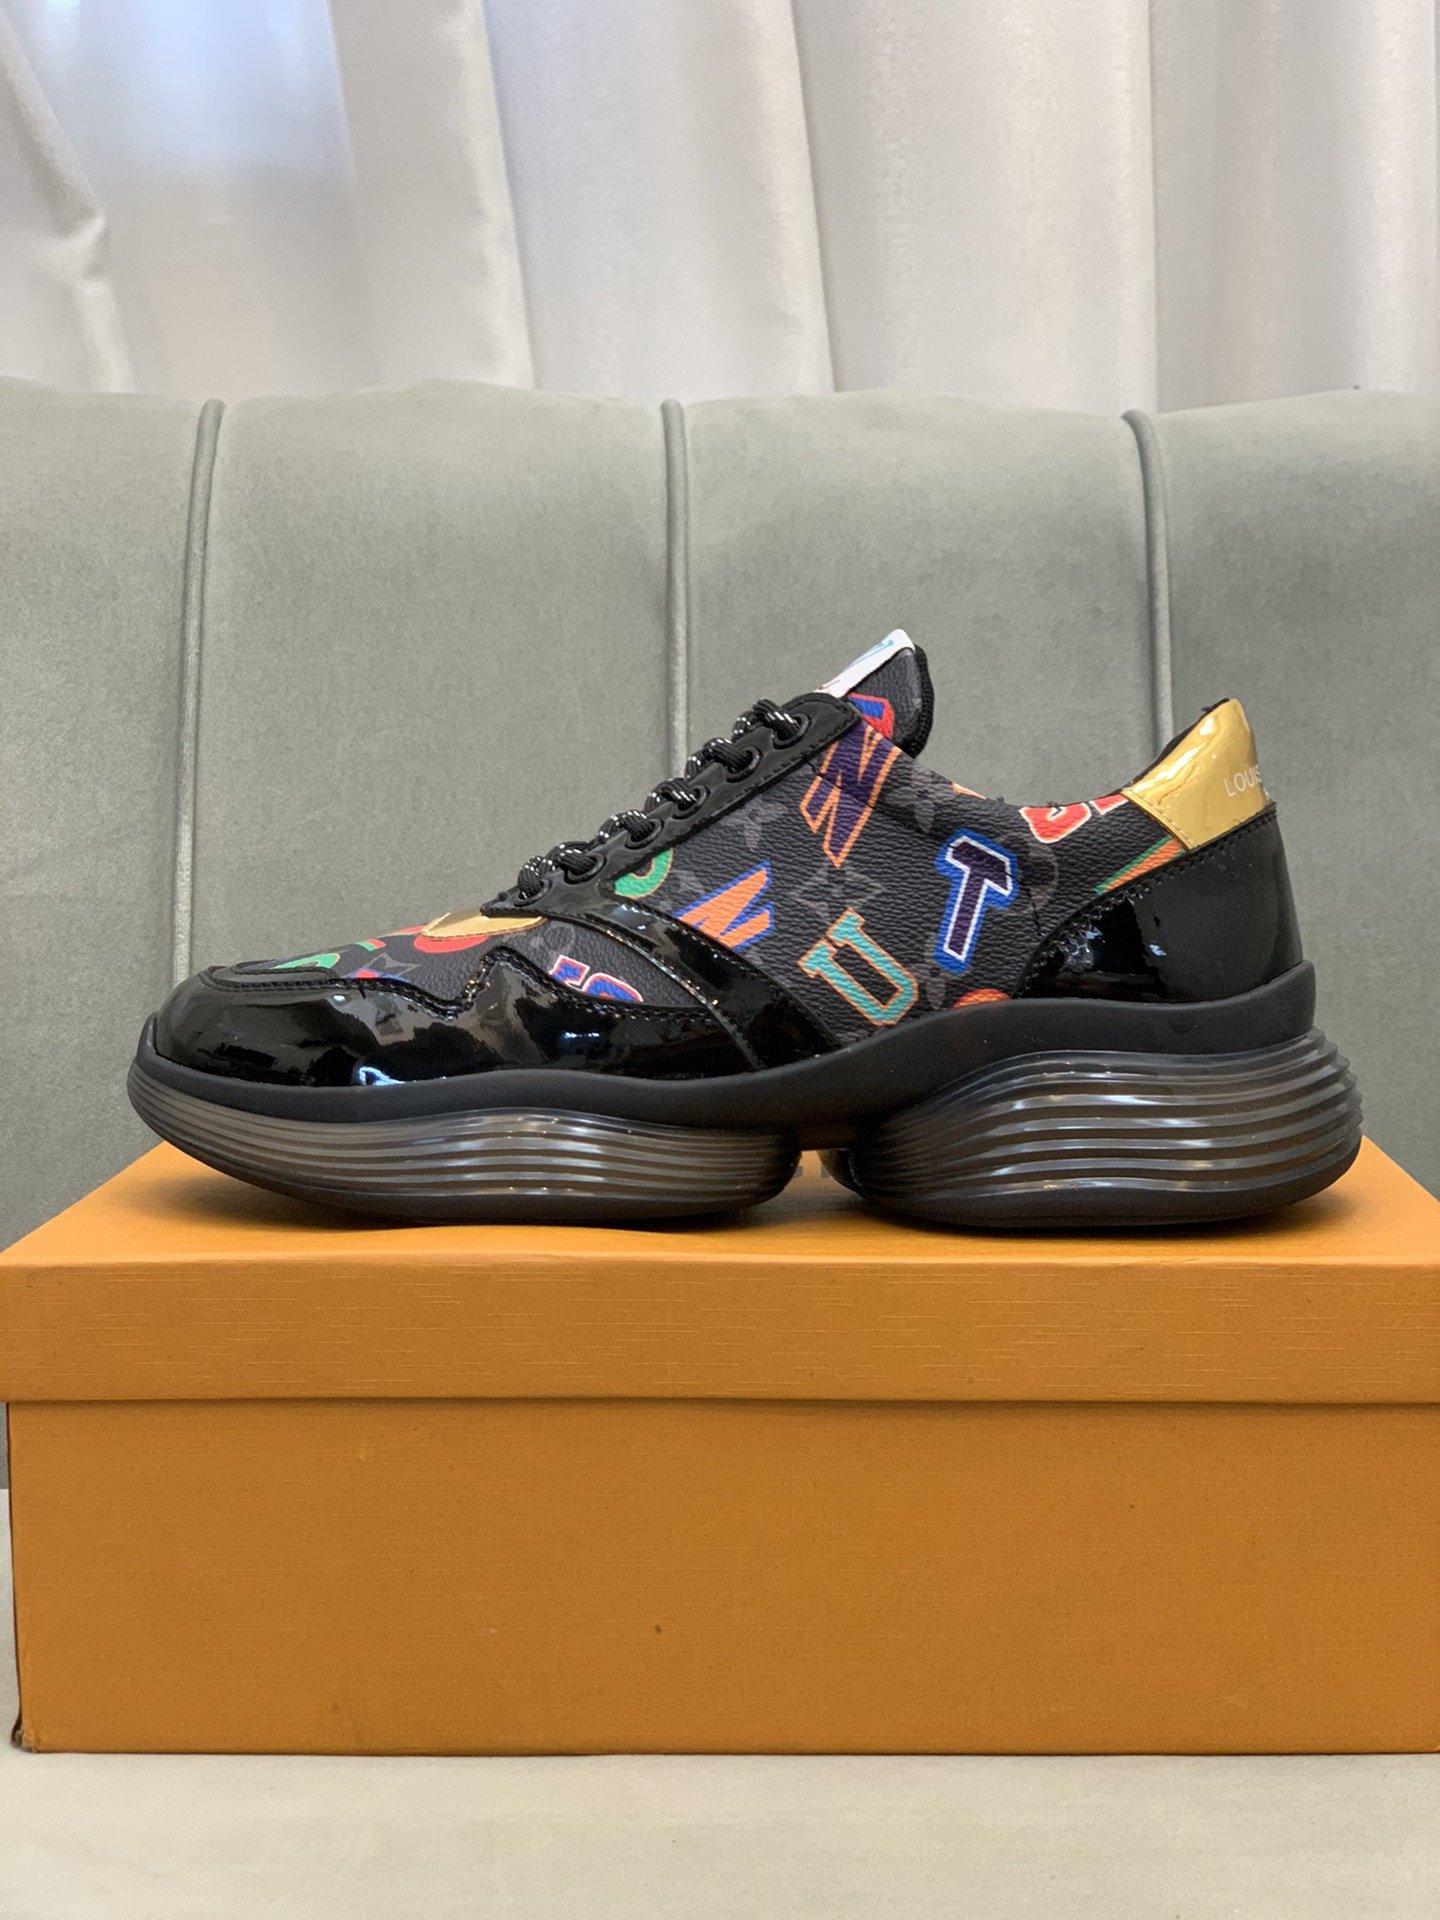 LV*路易威*低帮运动鞋正码码数:3